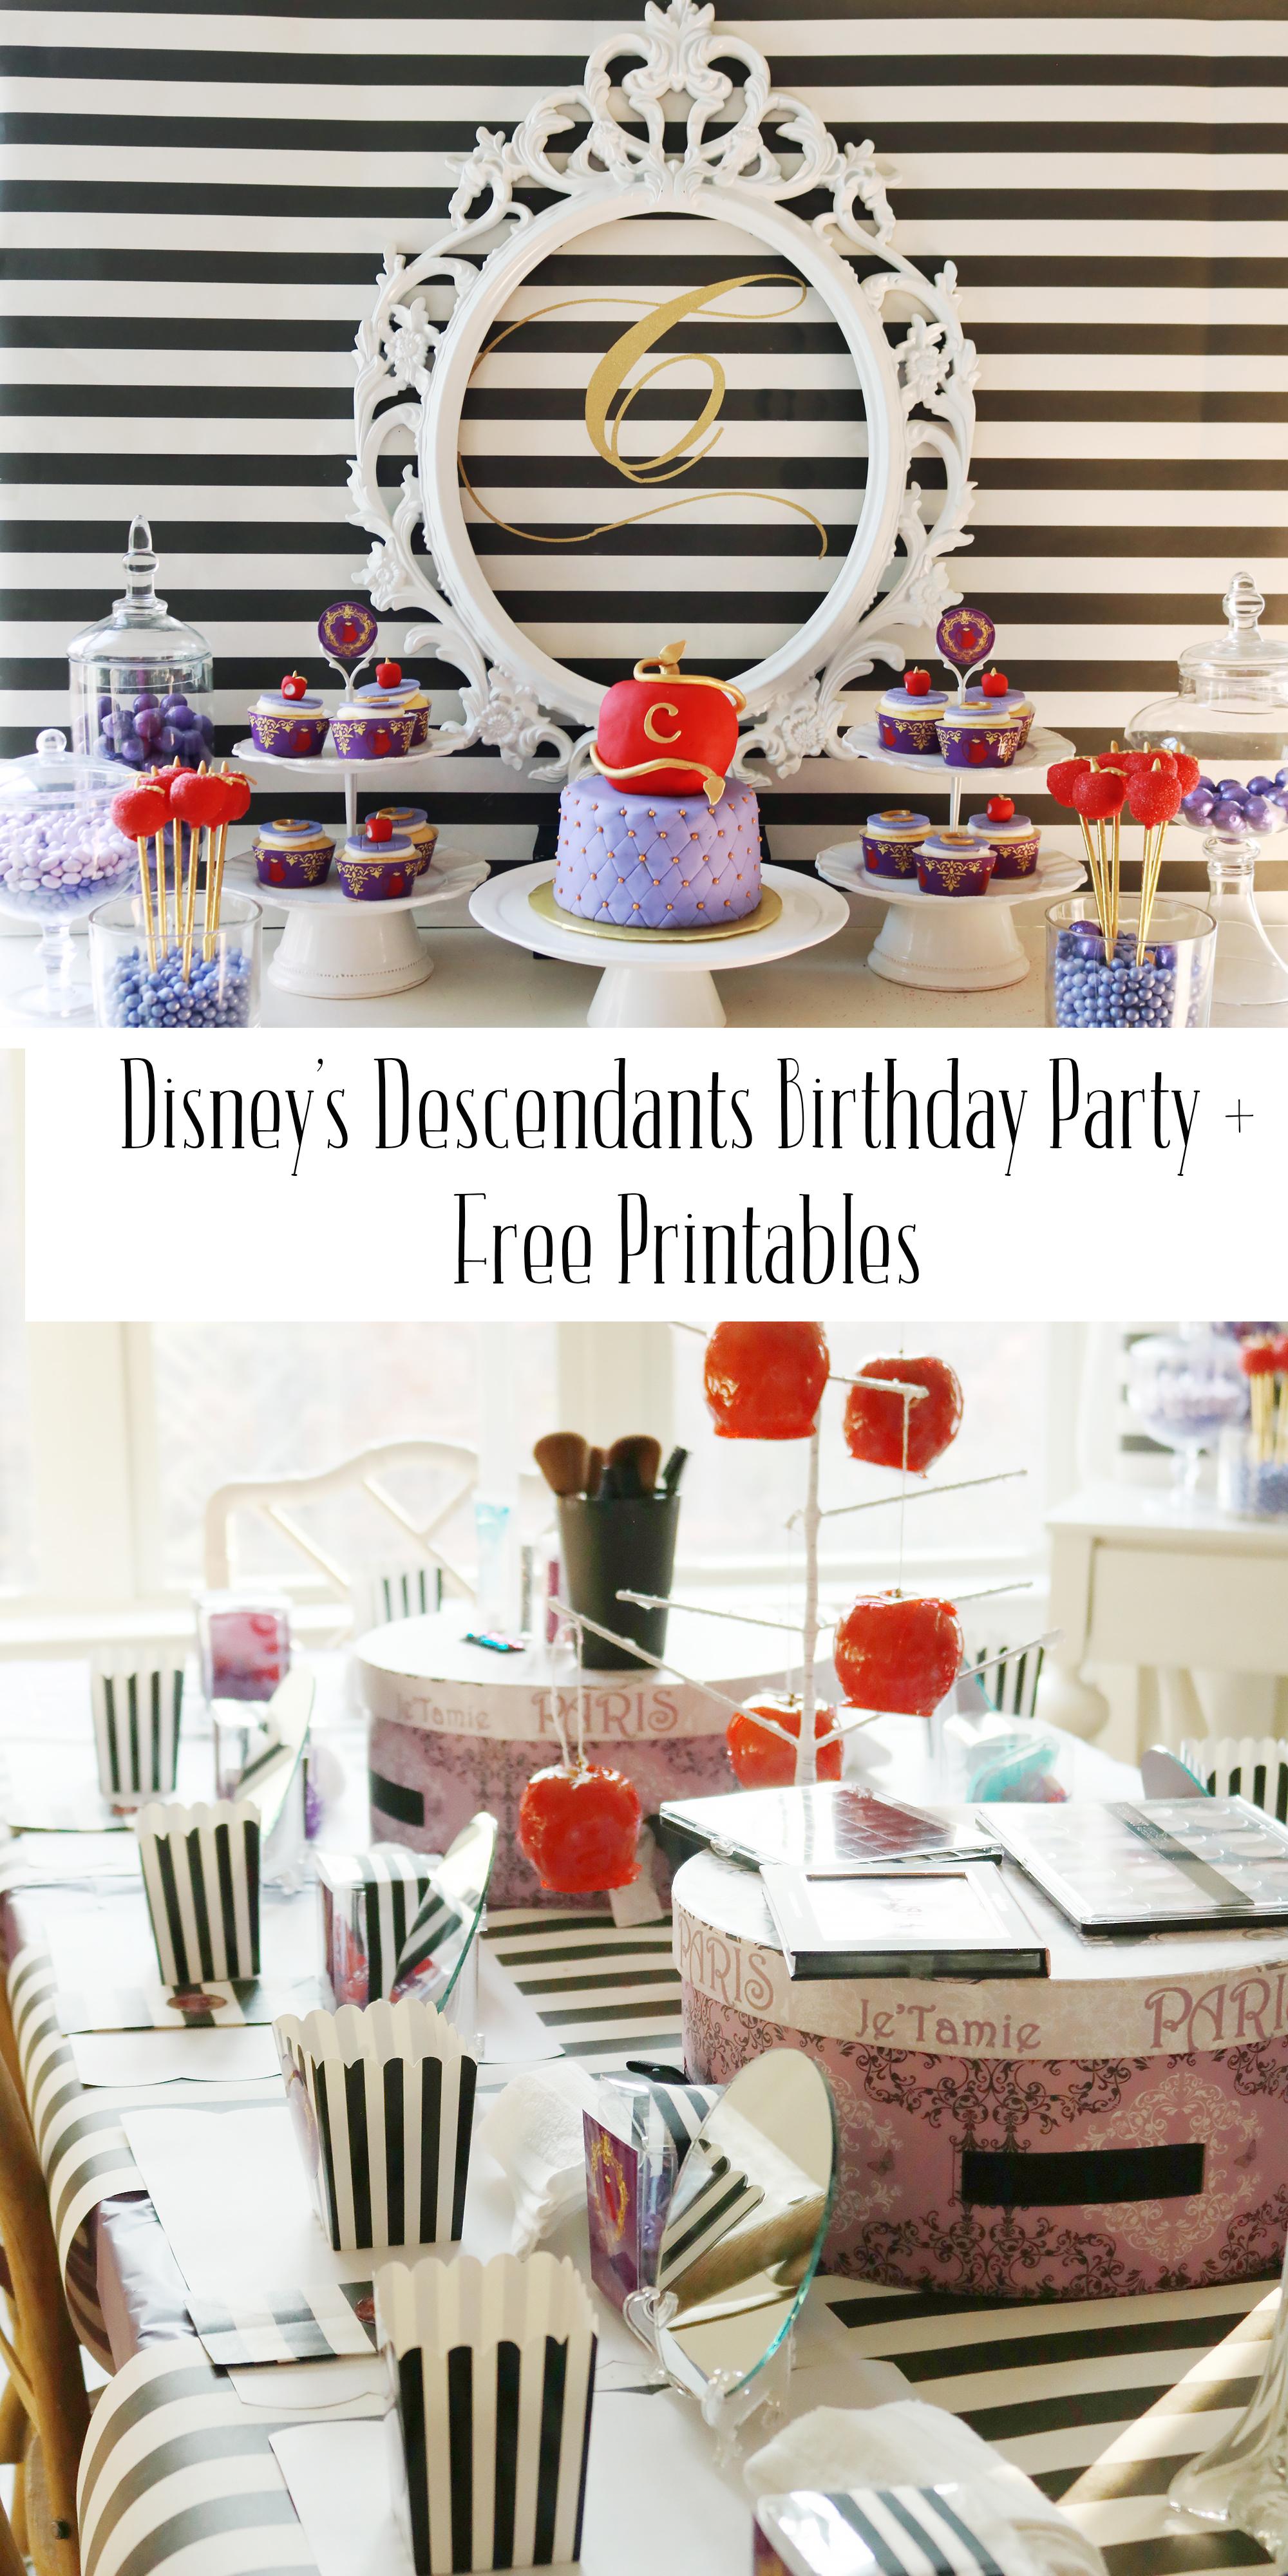 Disney's Descendants Birthday Party + Free Printables